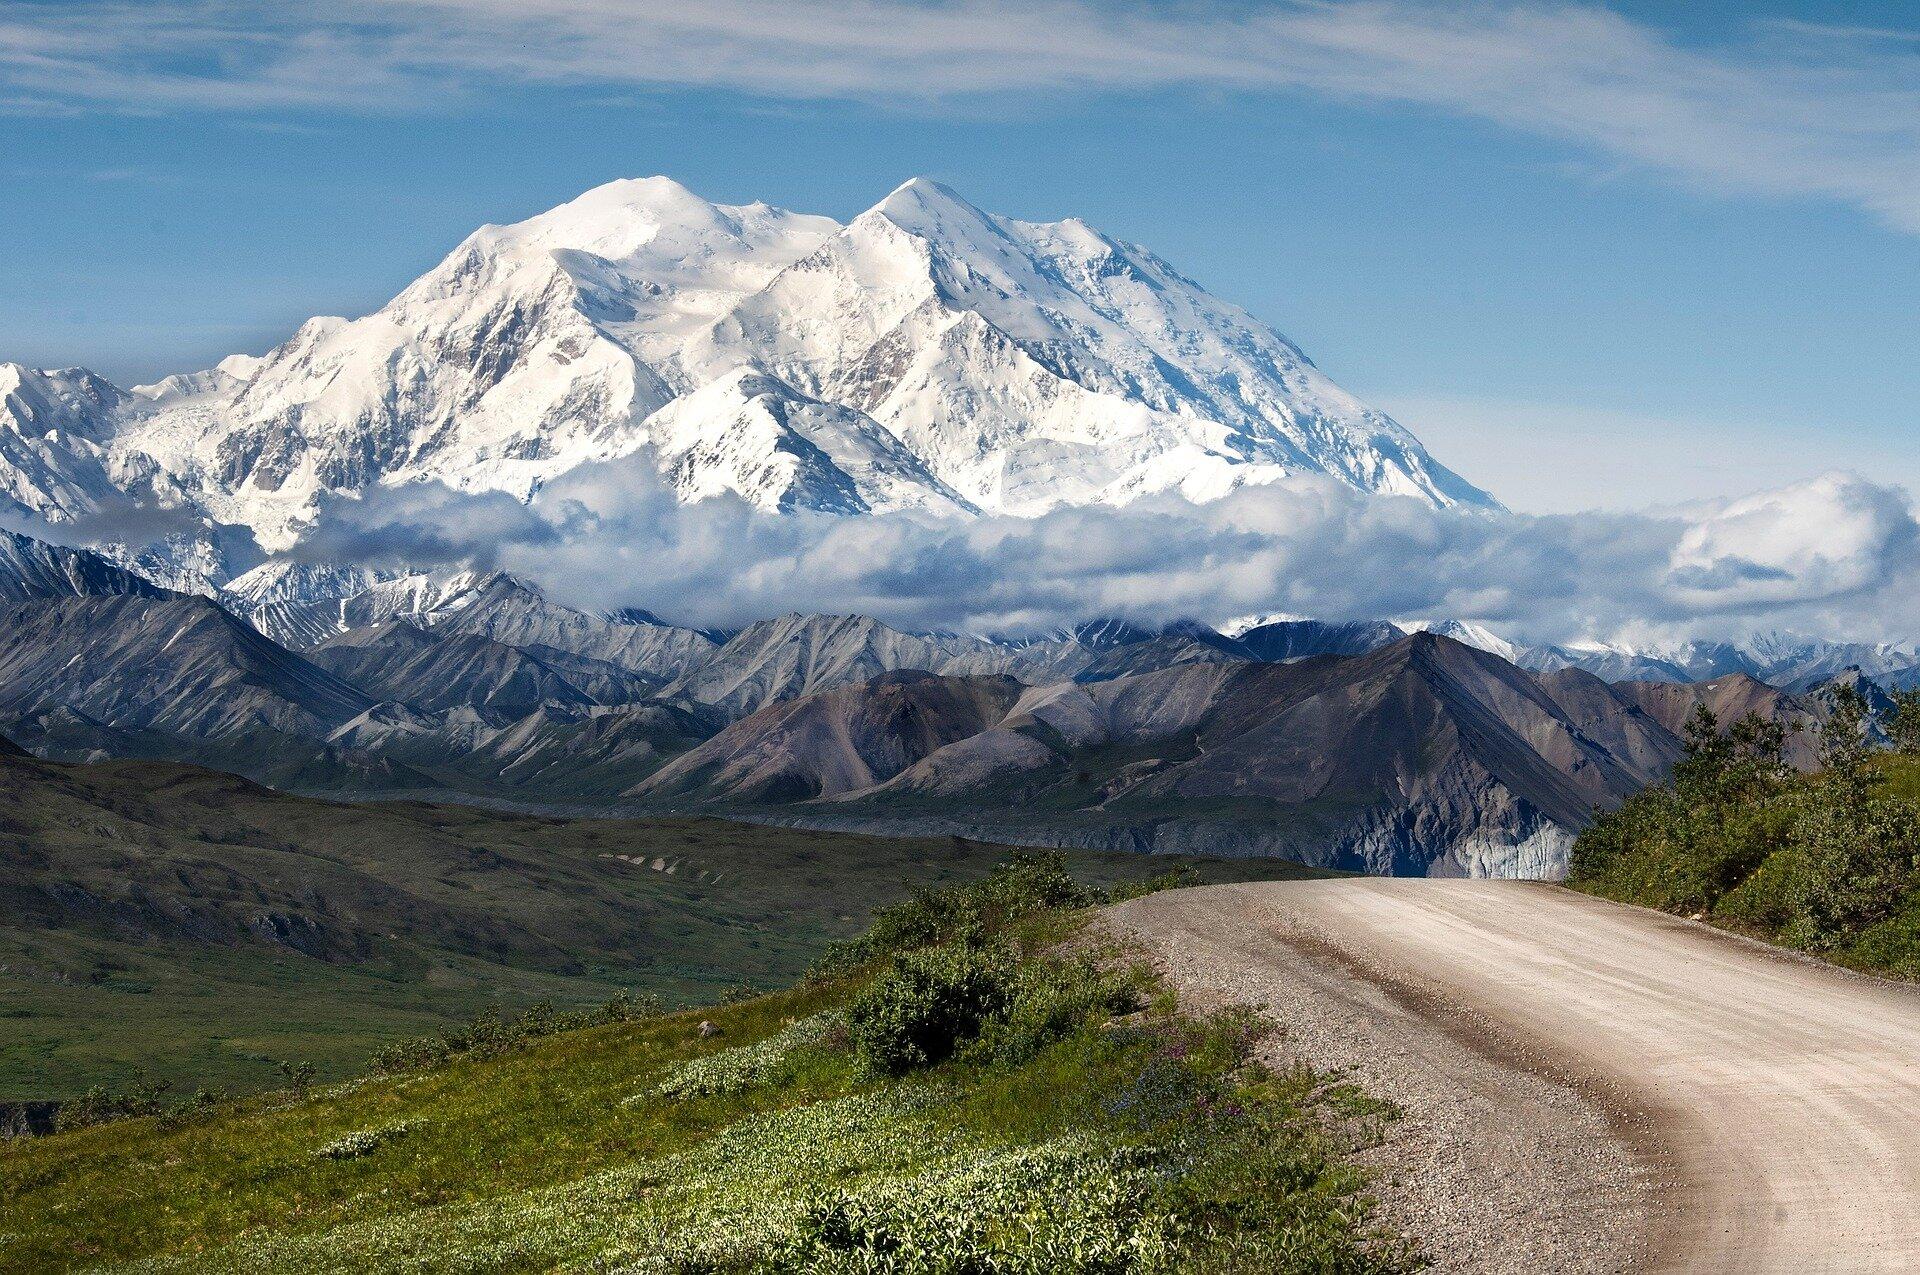 In Alaska forest, Reagan biographer sees a winning GOP strategy